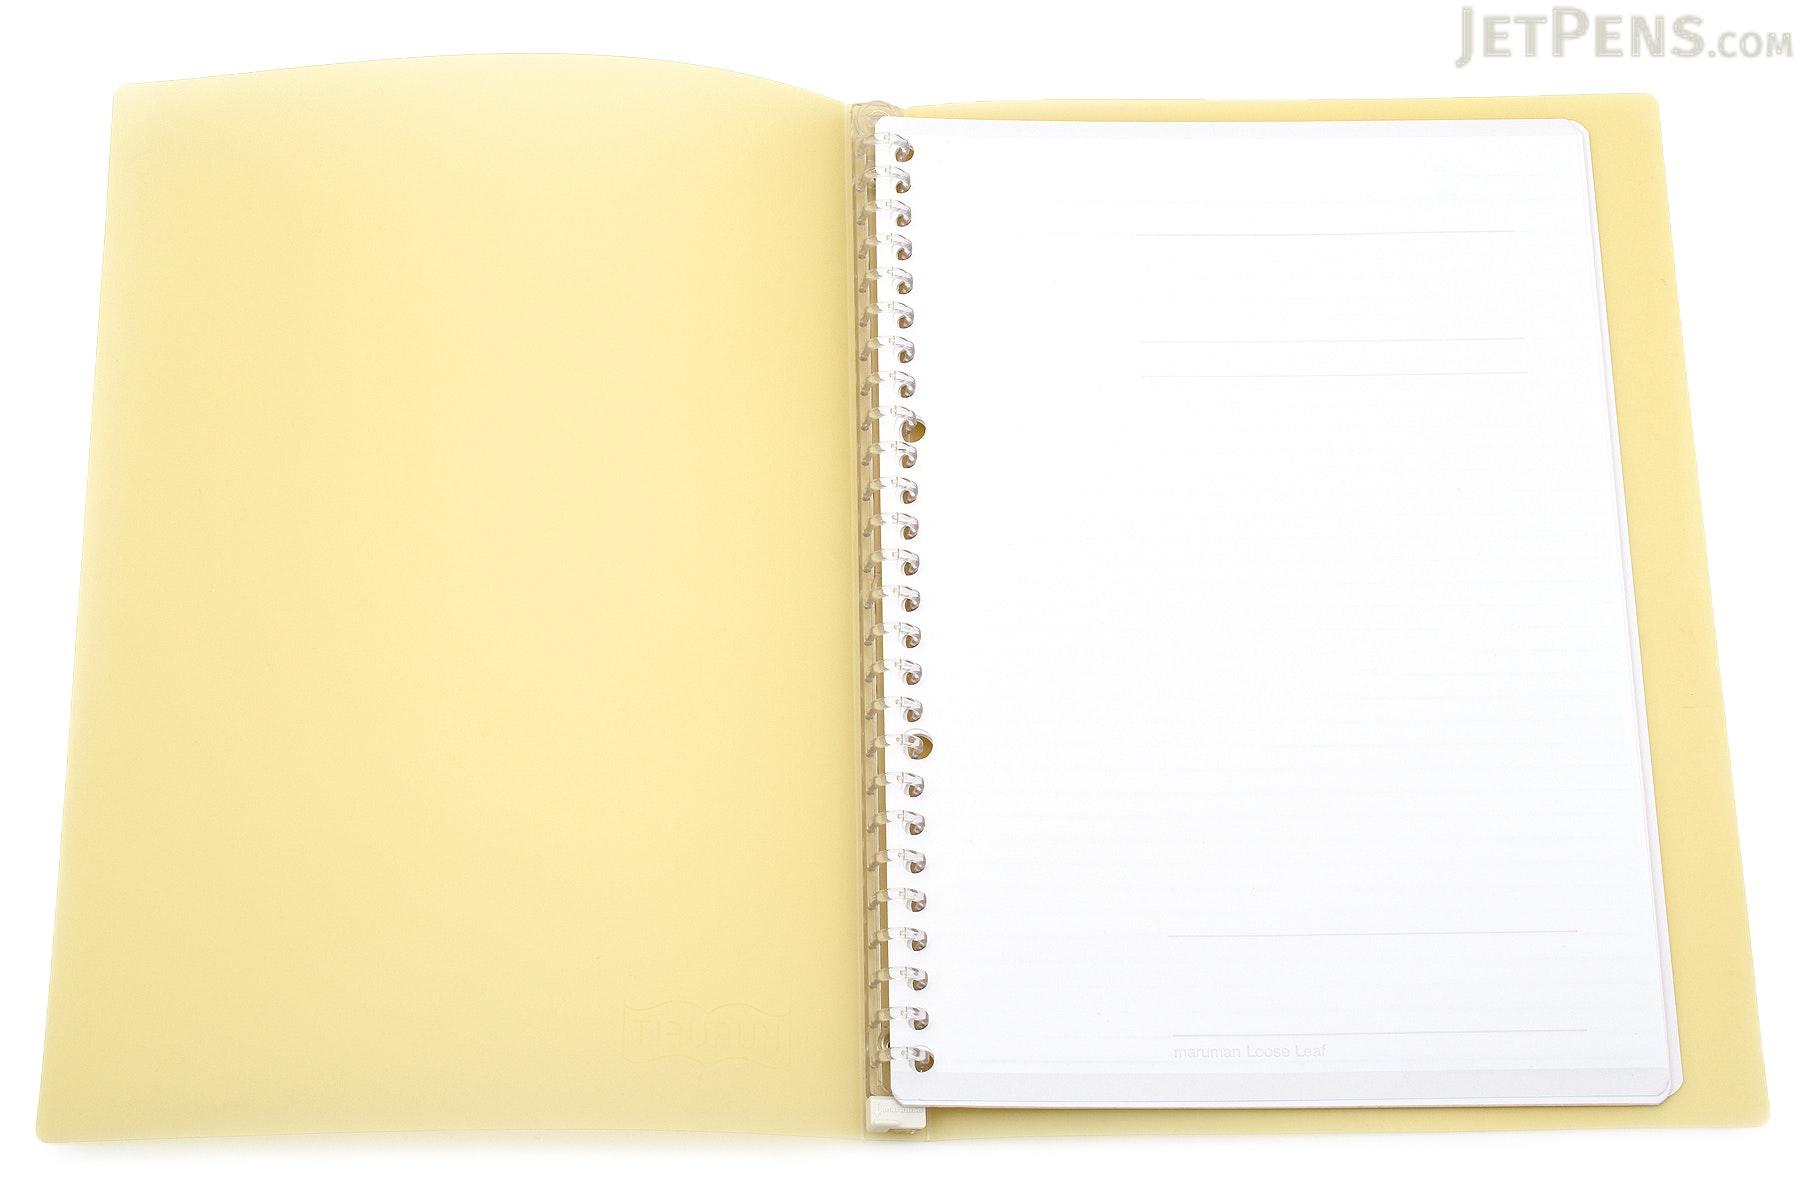 Maruman Kurufit Binder - B5 - 26 Rings - Yellow - MARUMAN F020-04